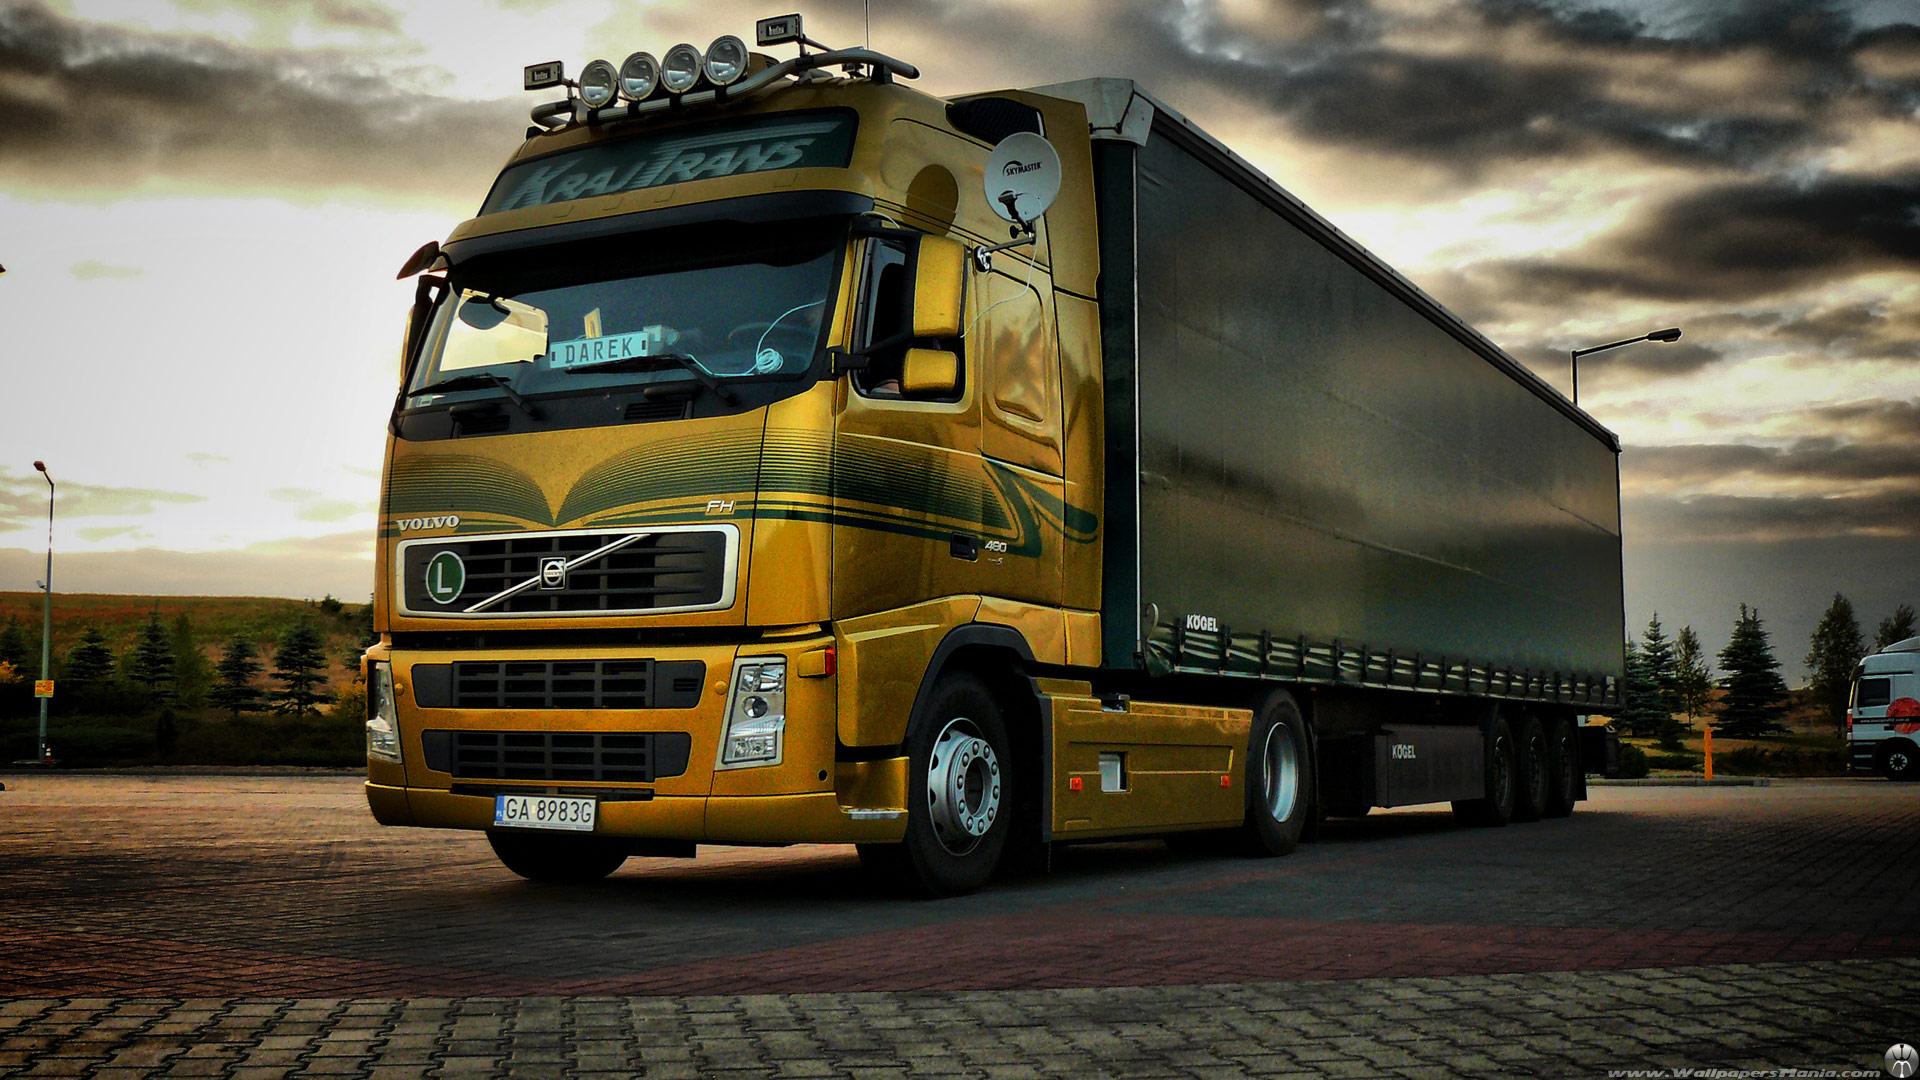 Wallpaper Truck Volvo >> Volvo Truck Wallpaper - WallpaperSafari